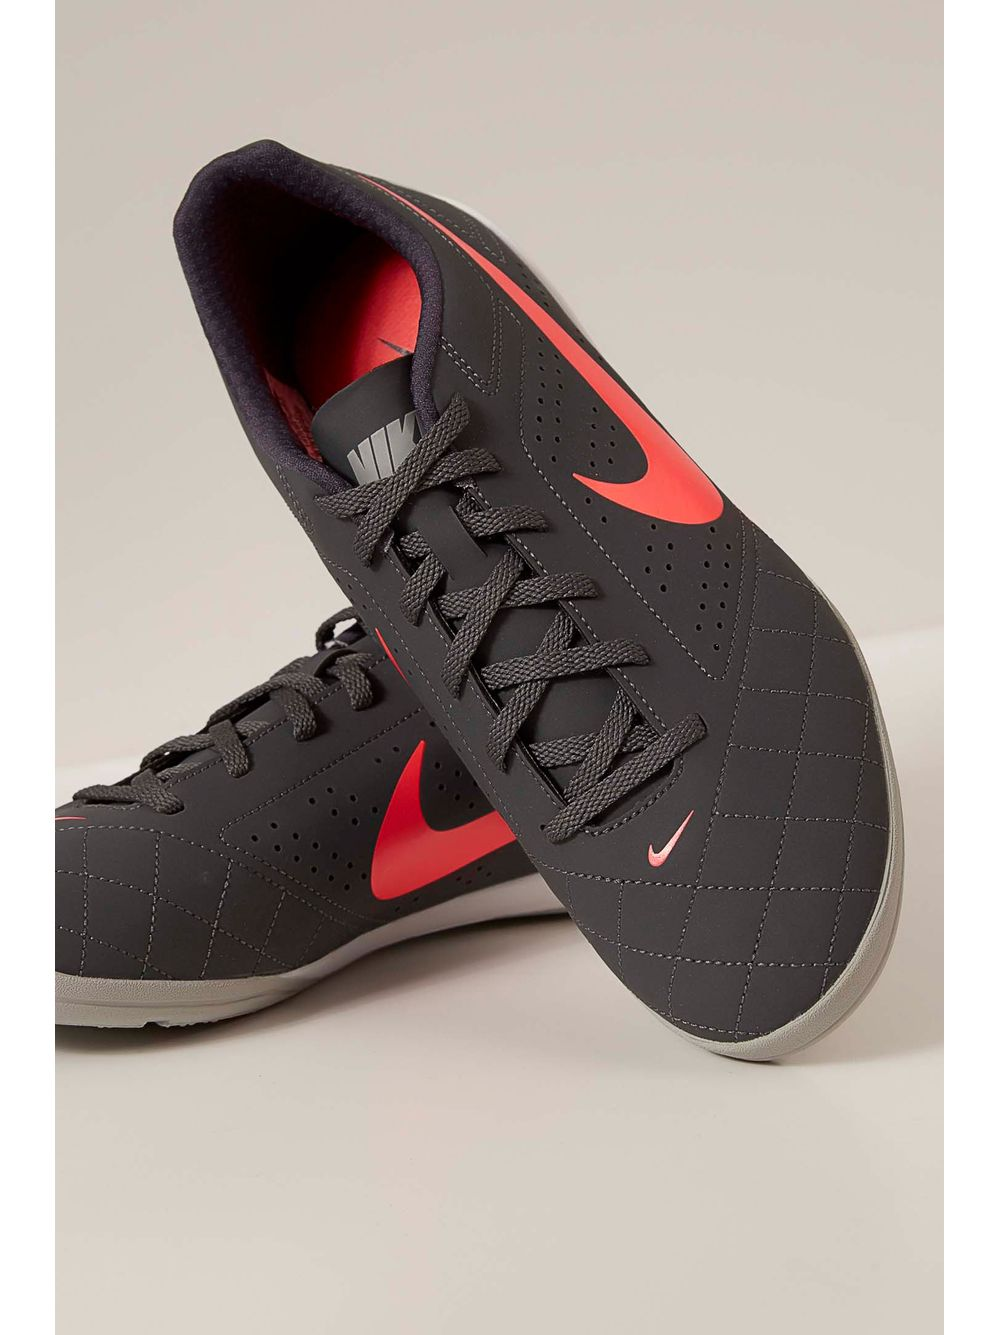 21601d5d6b Tênis Futsal Nike Beco Chumbo - pittol